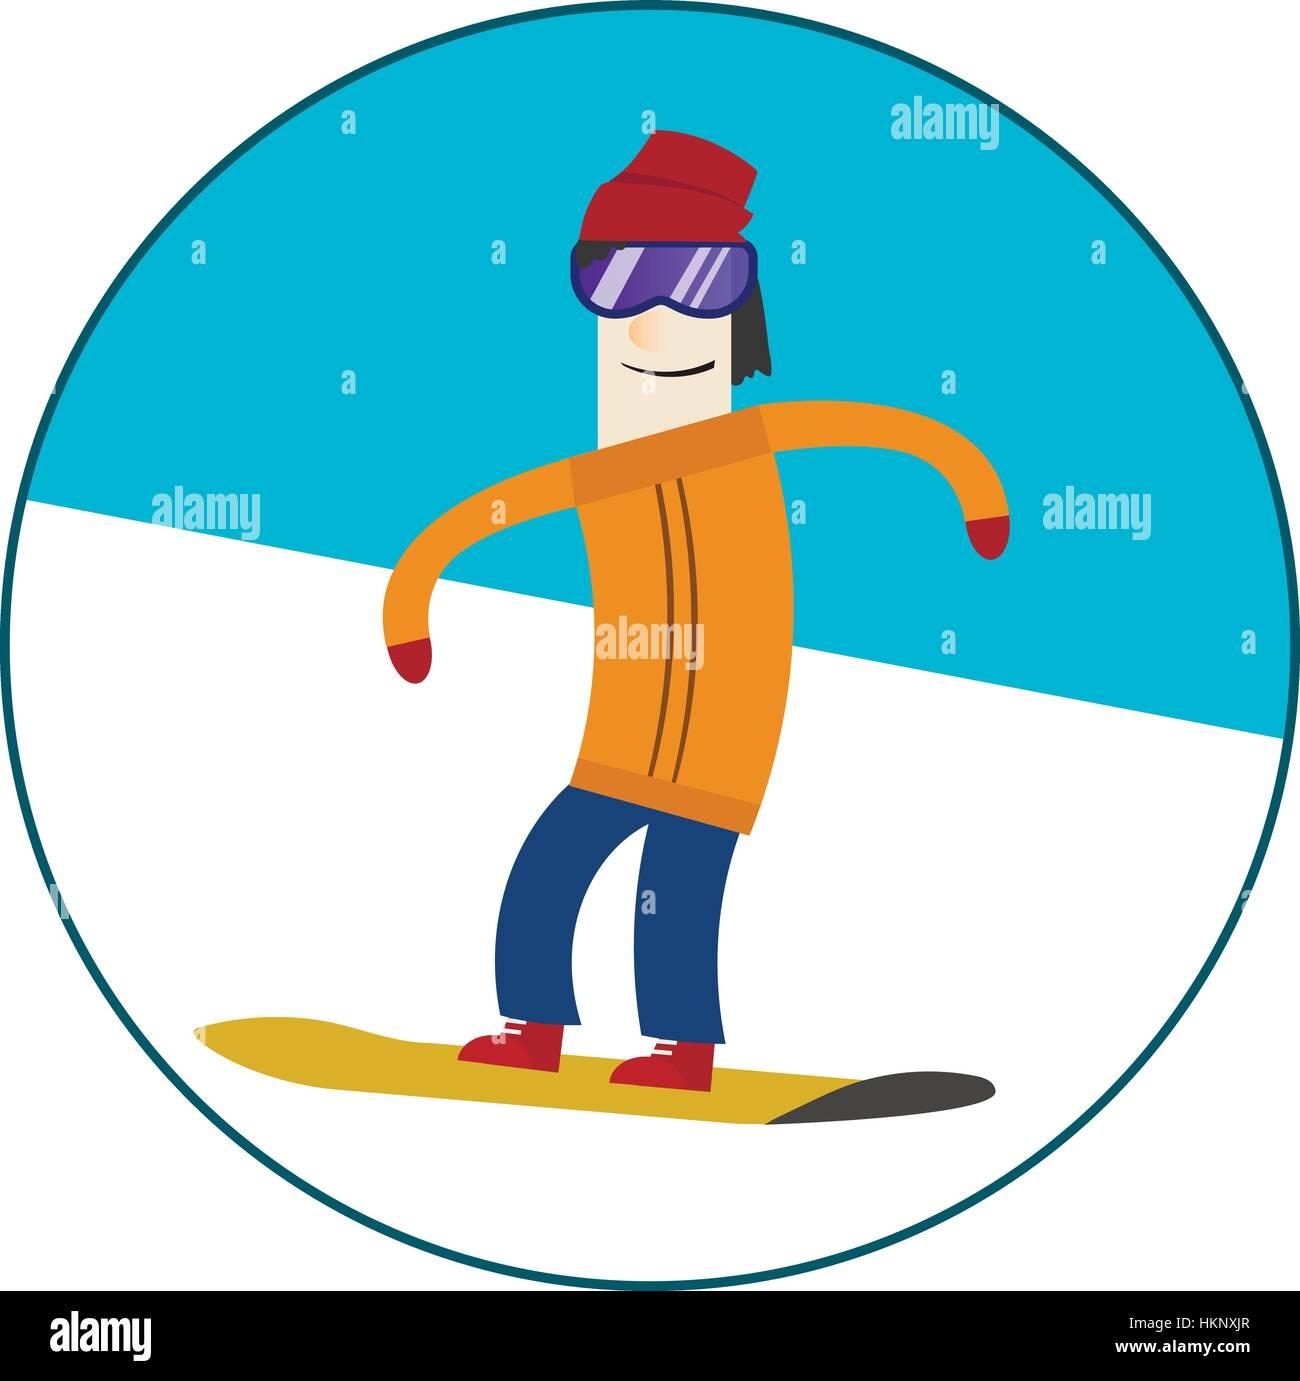 Man riding on a snowboard Stock Vector